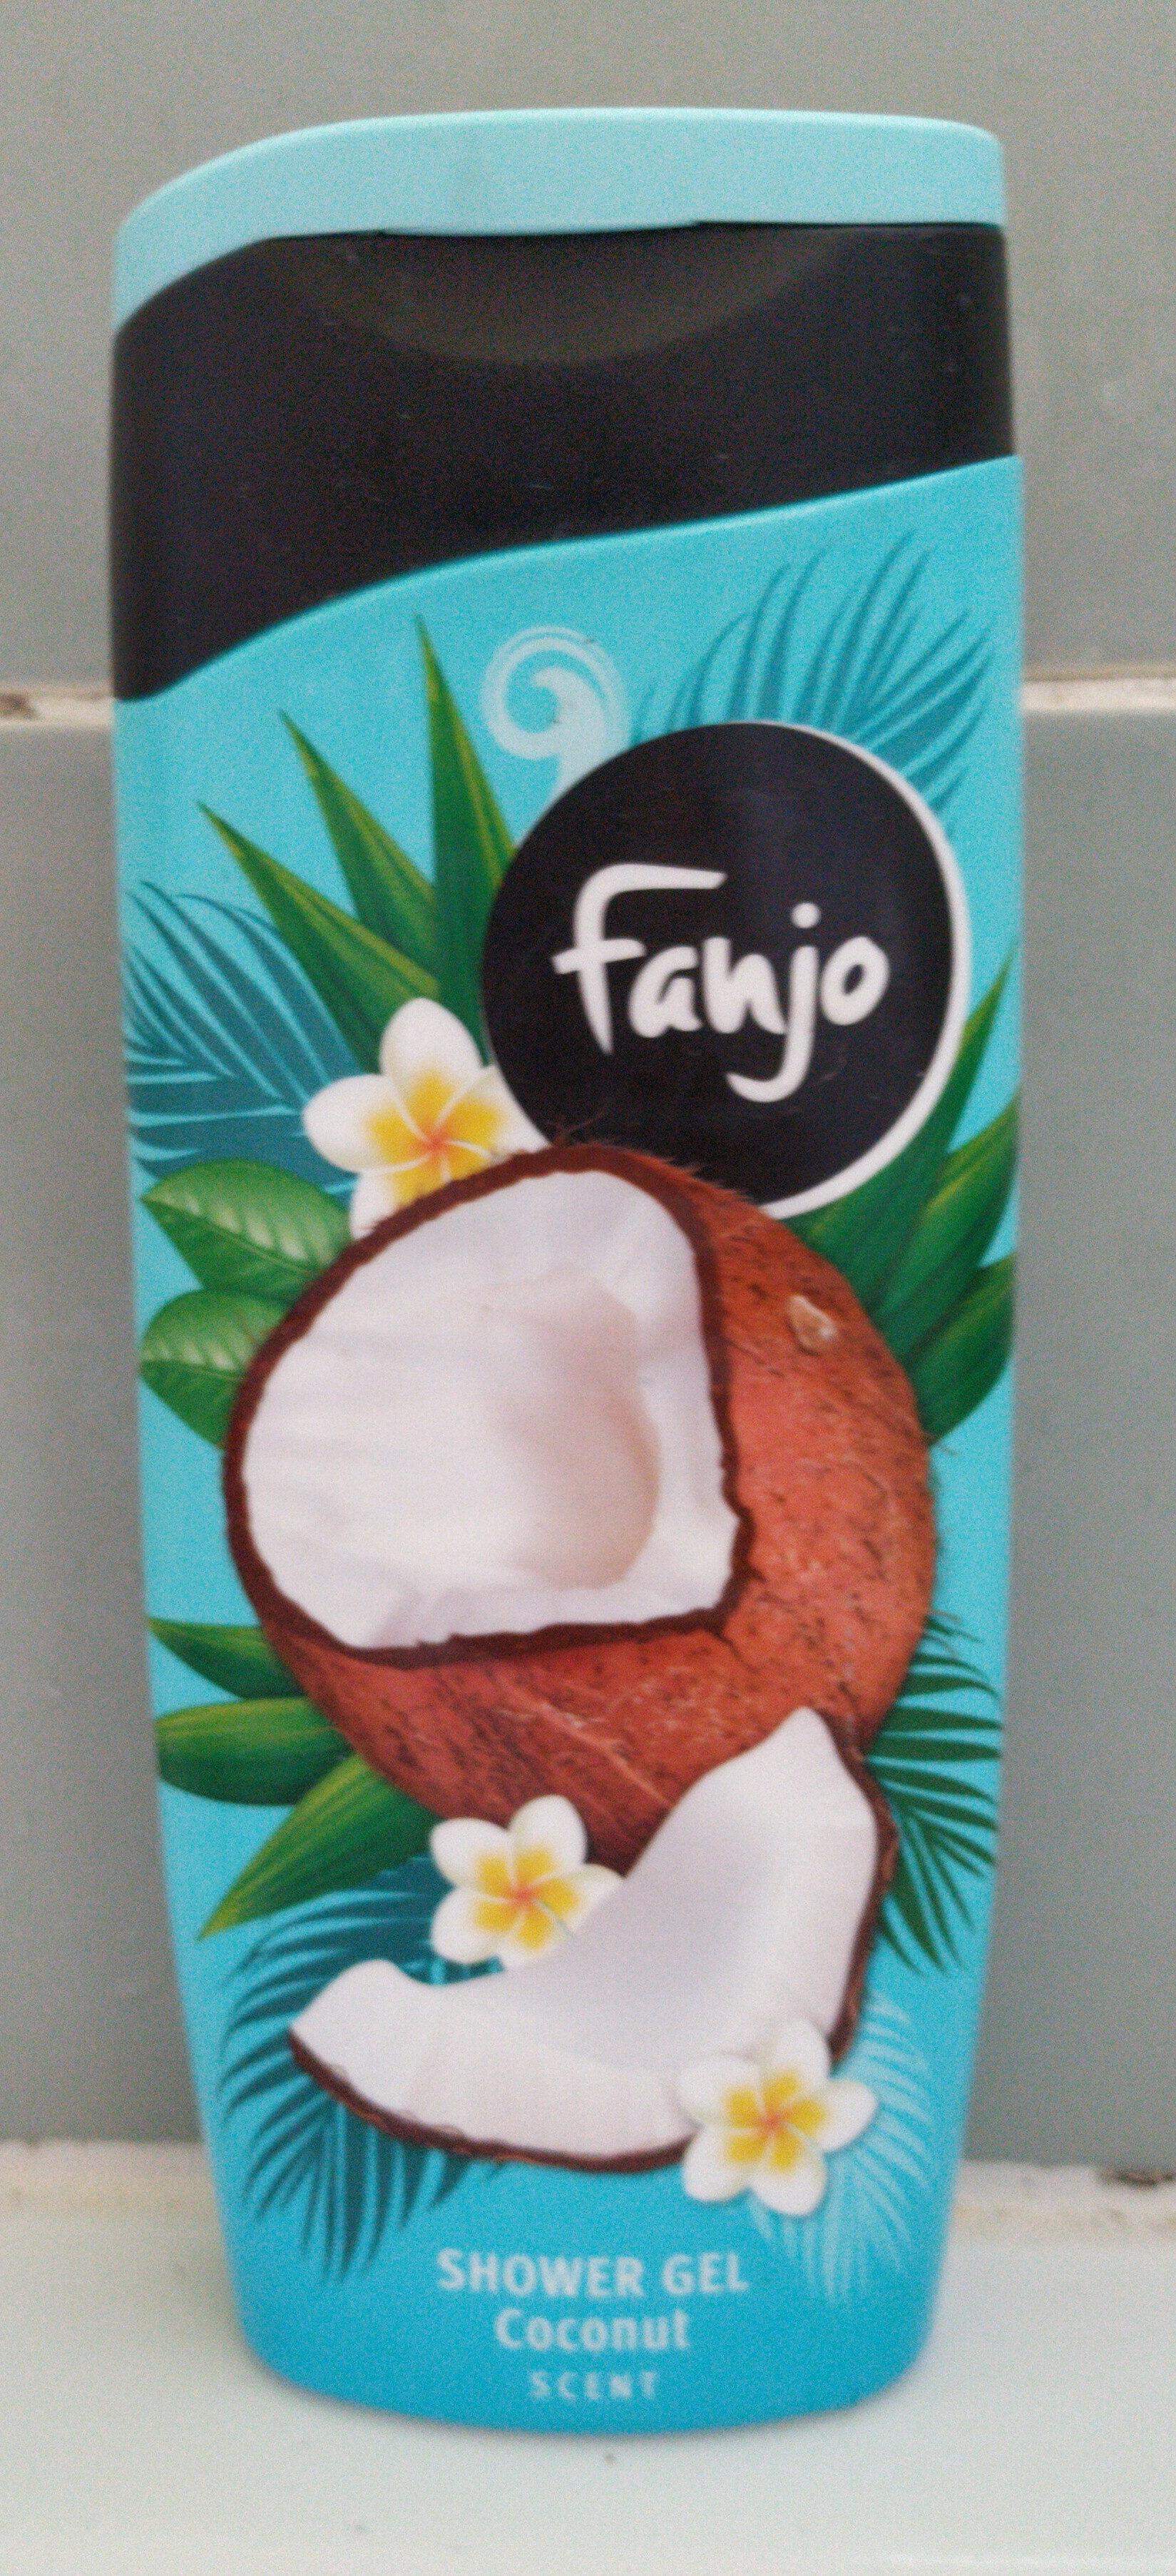 shower gel coconut - Product - en